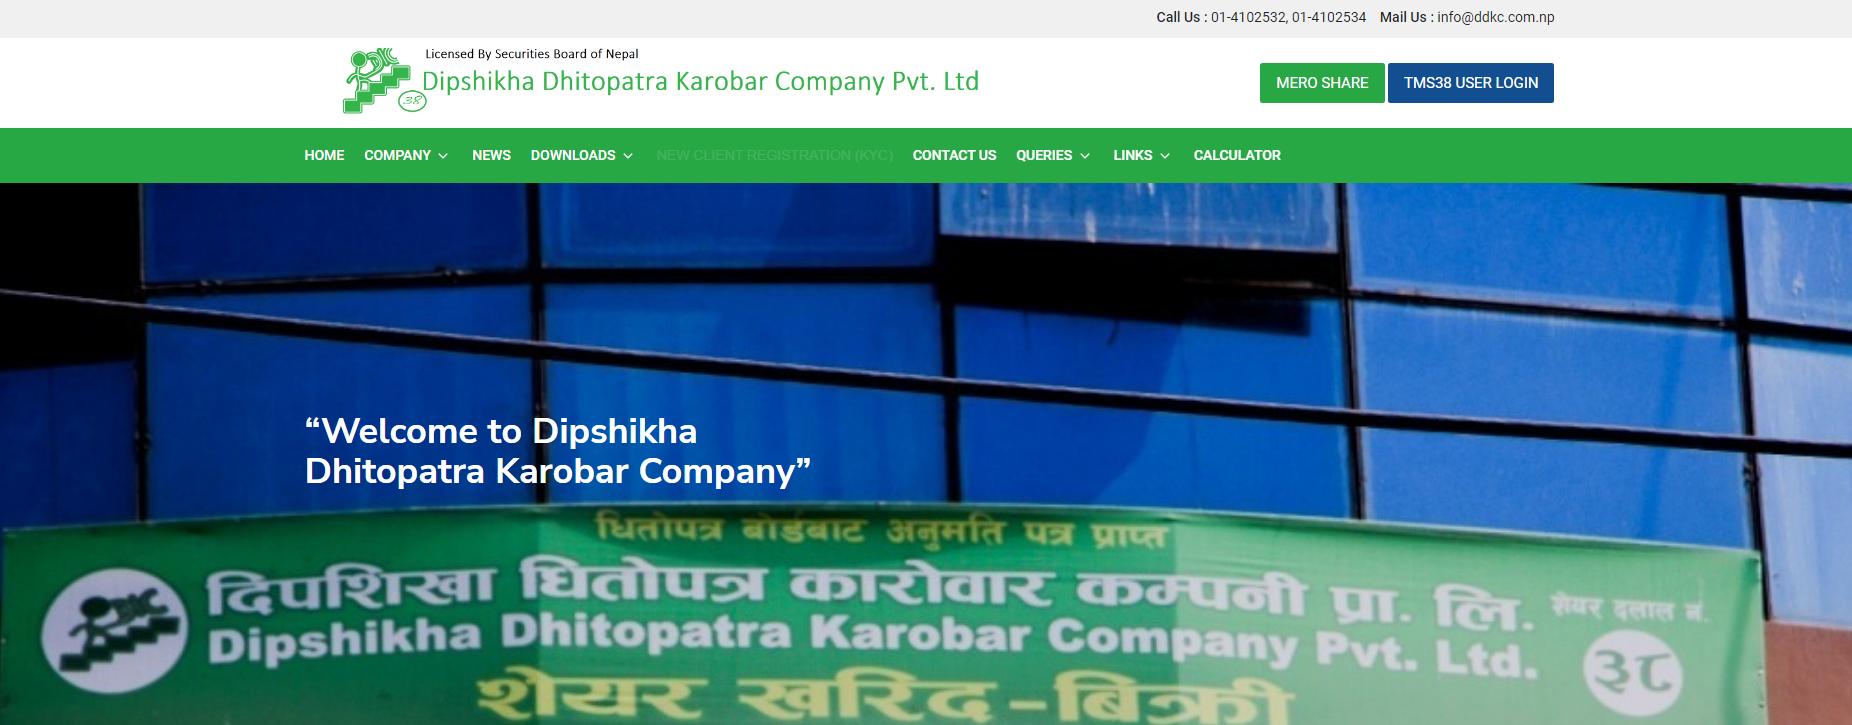 dipshikha dhitopatra karobar company pvt ltd сайт брокера